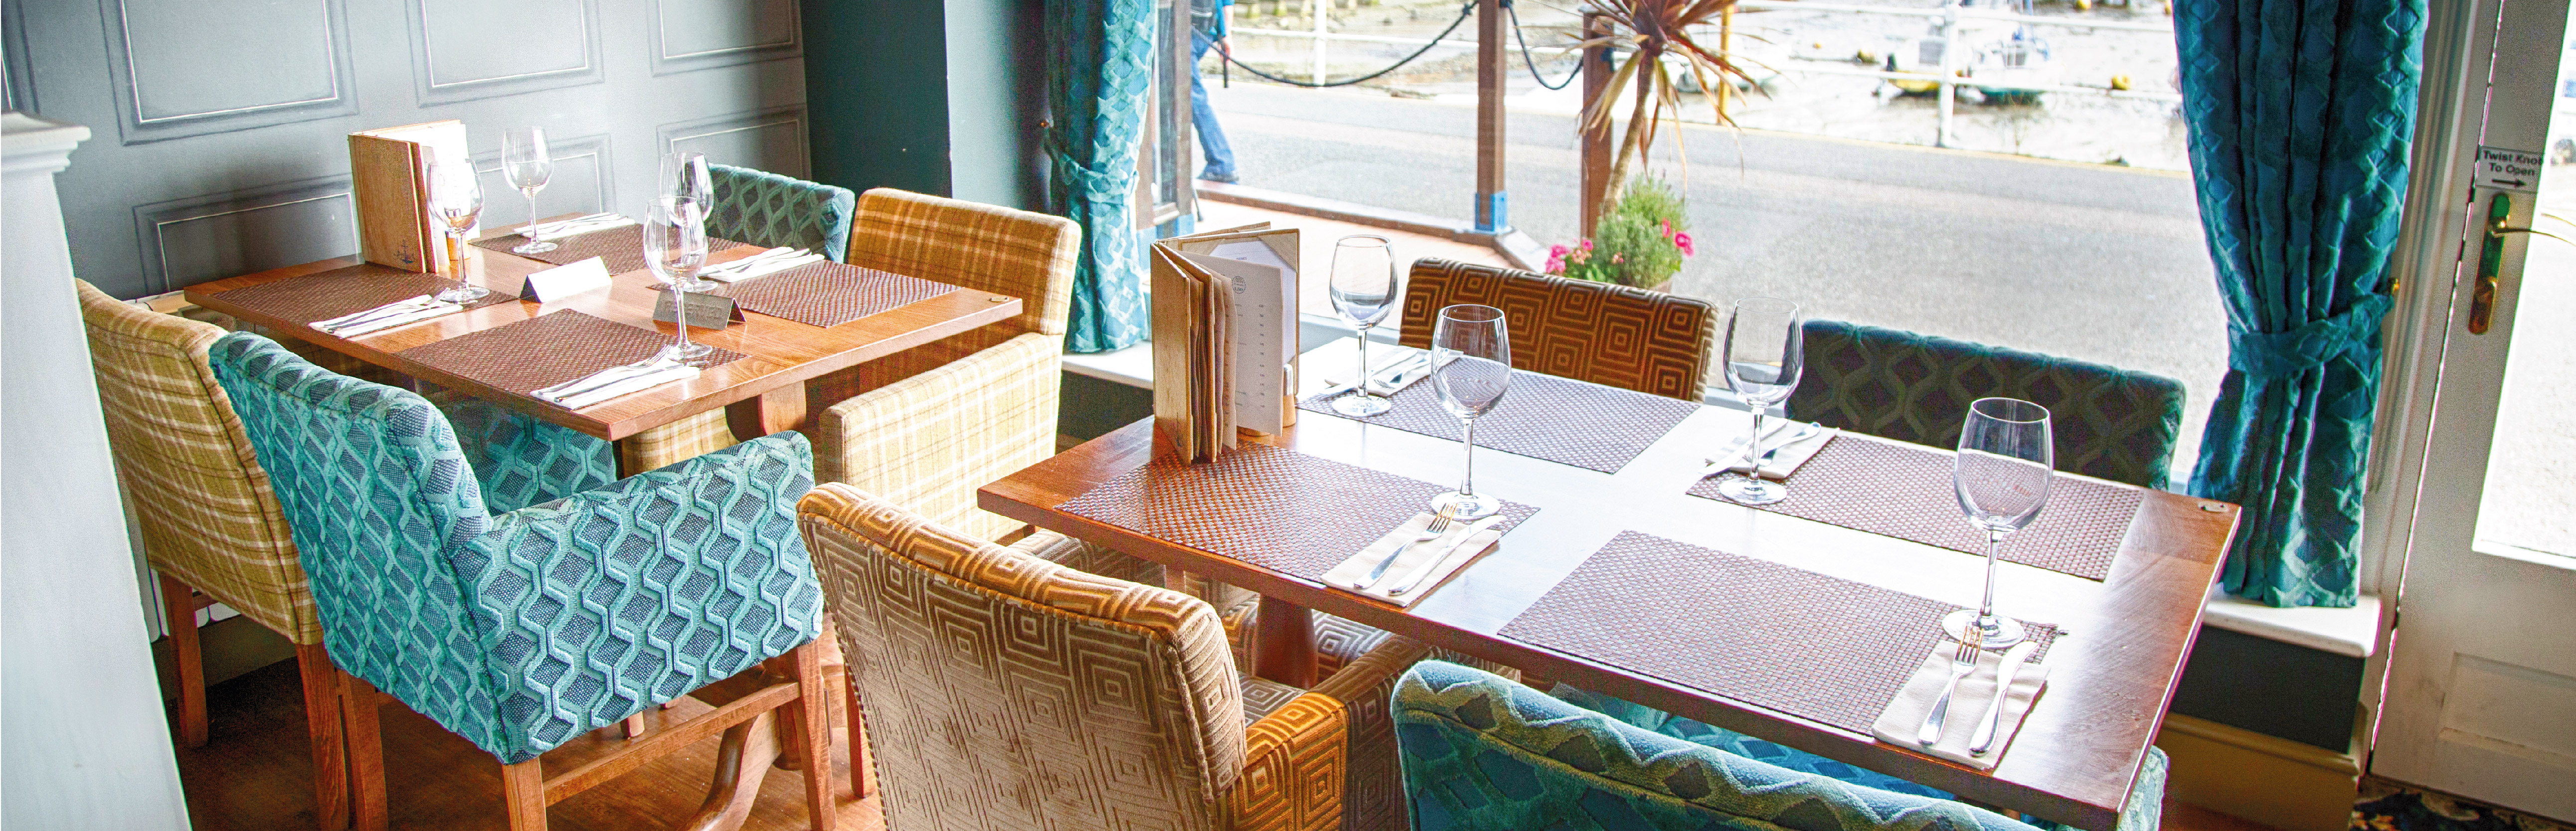 Randalls The Tenby Pub and Restaurant Jersey